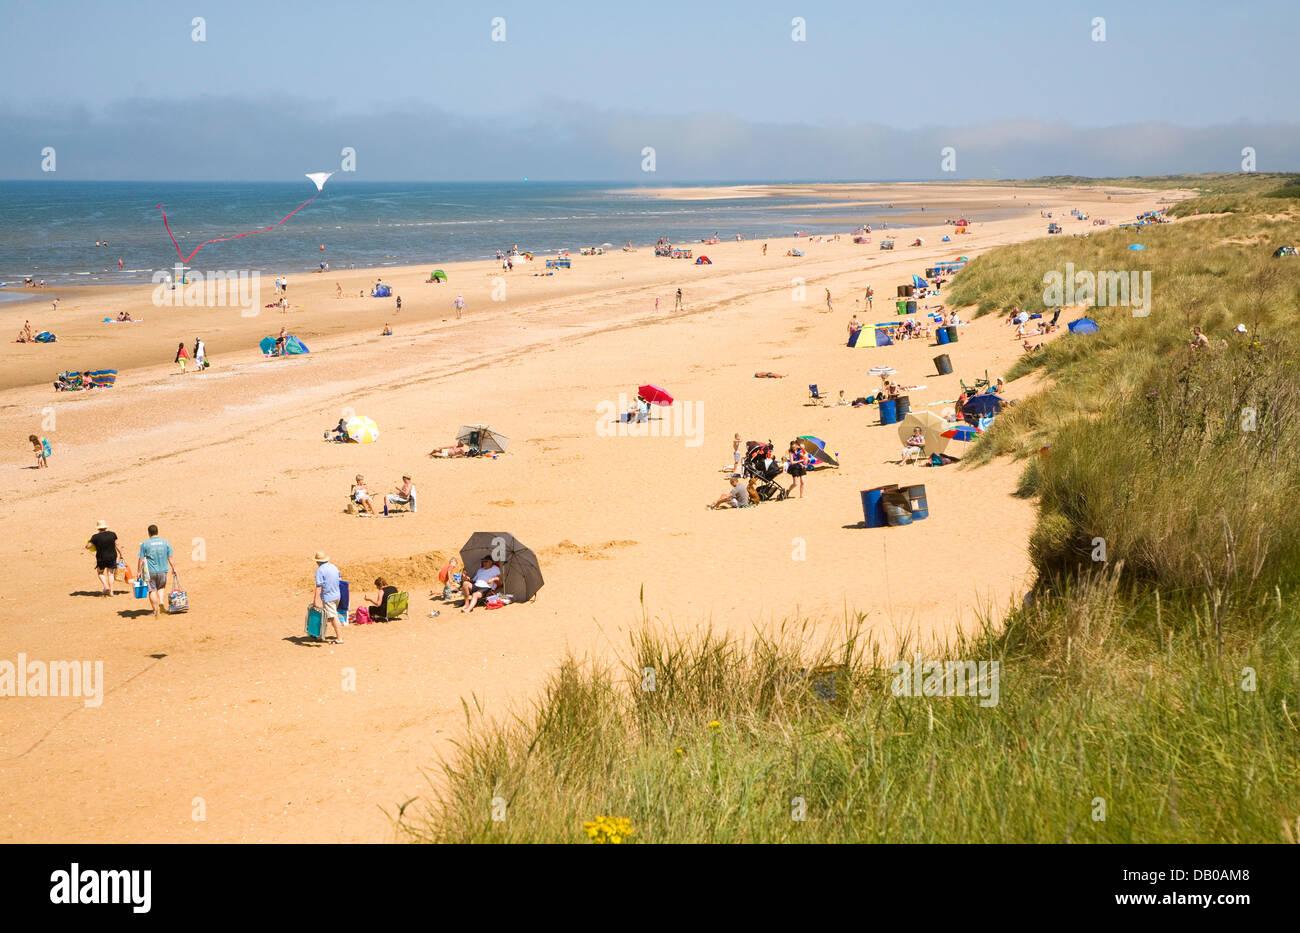 People on wide sandy beach Hunstanton Norfolk England - Stock Image